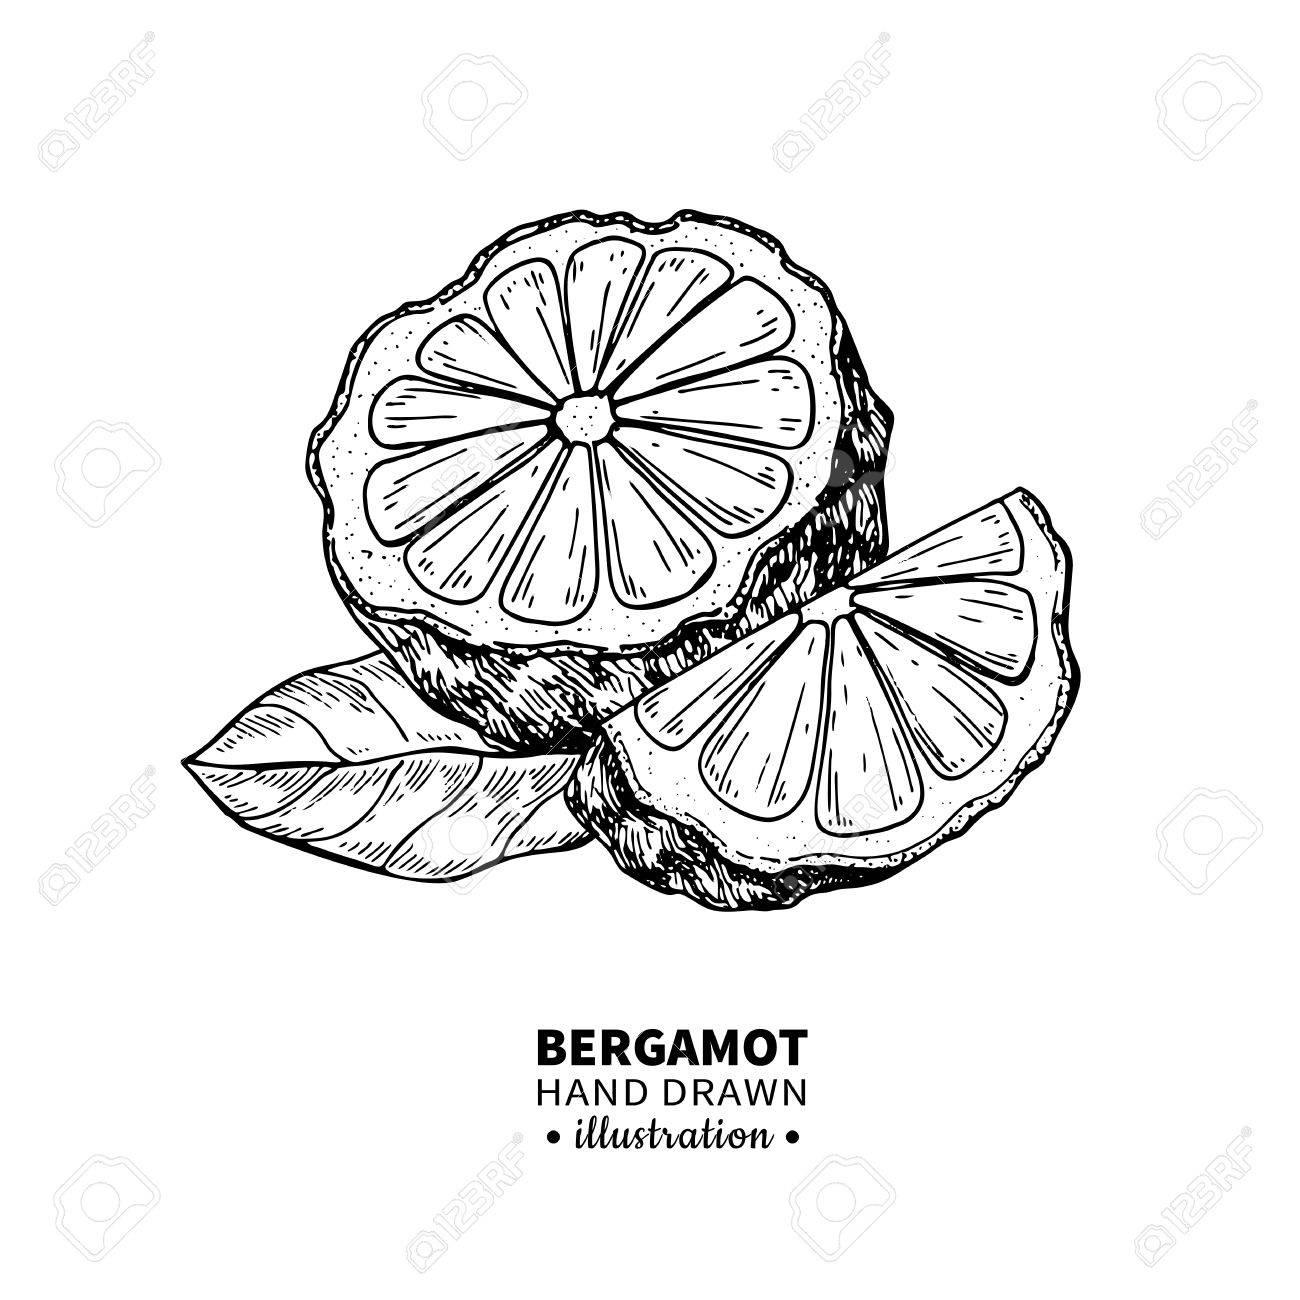 1300x1300 Bergamot Vector Drawing. Isolated Vintage Illustration Of Citrus